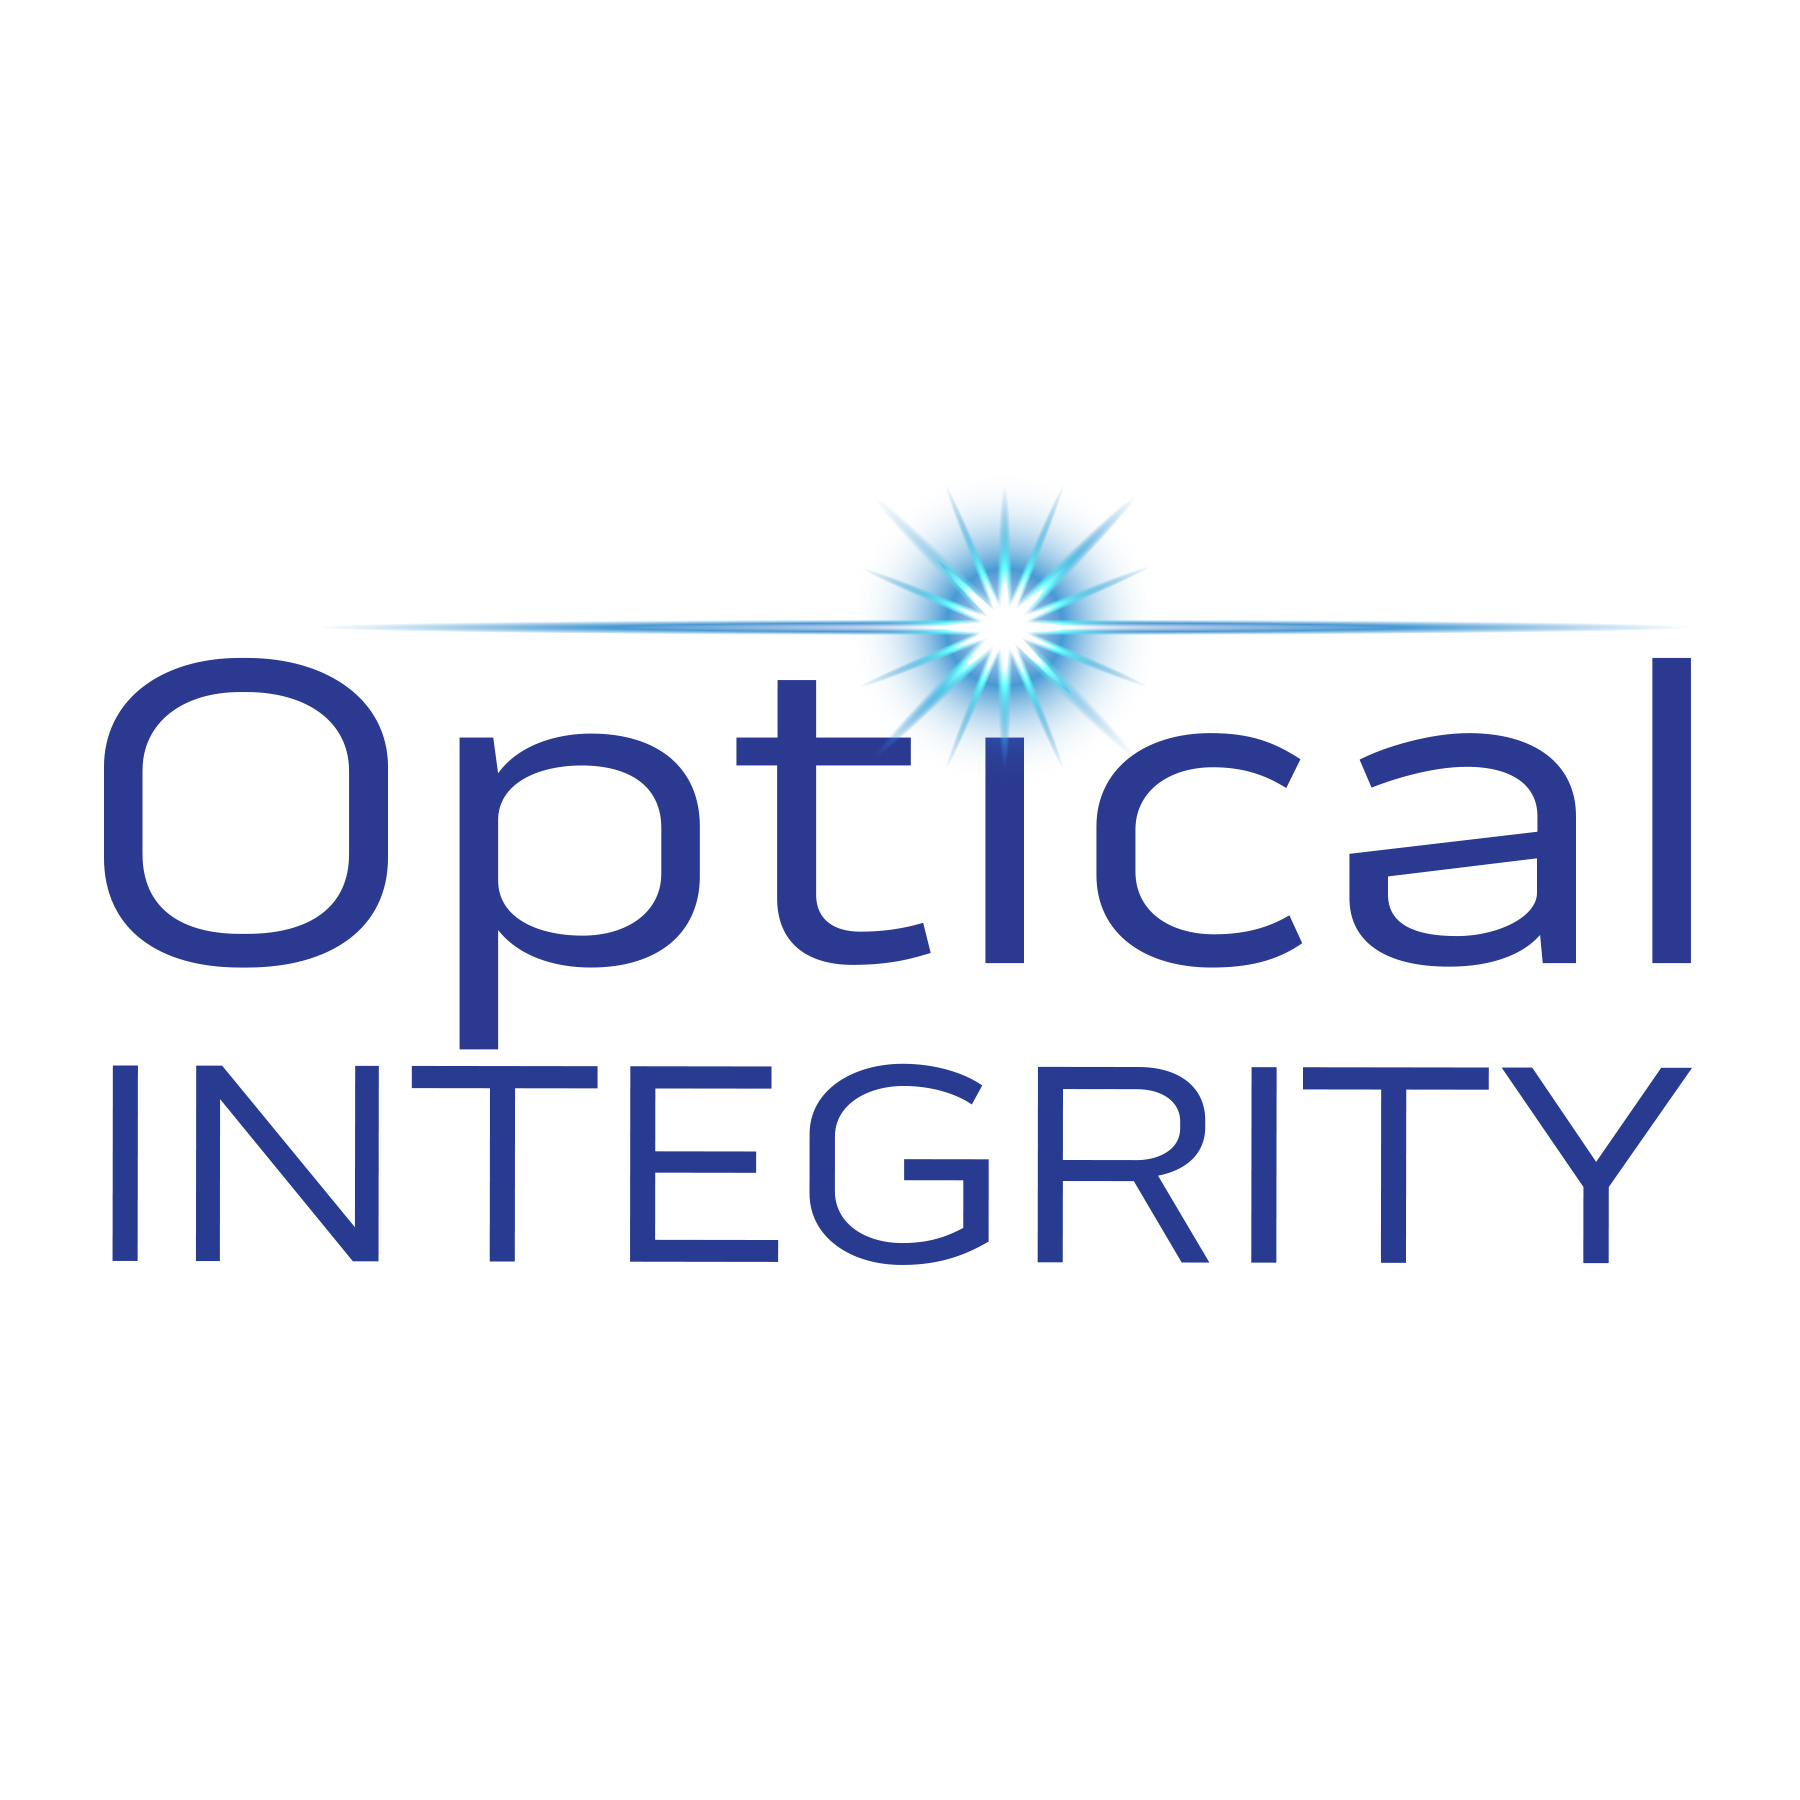 Optical Integrity Company Logo